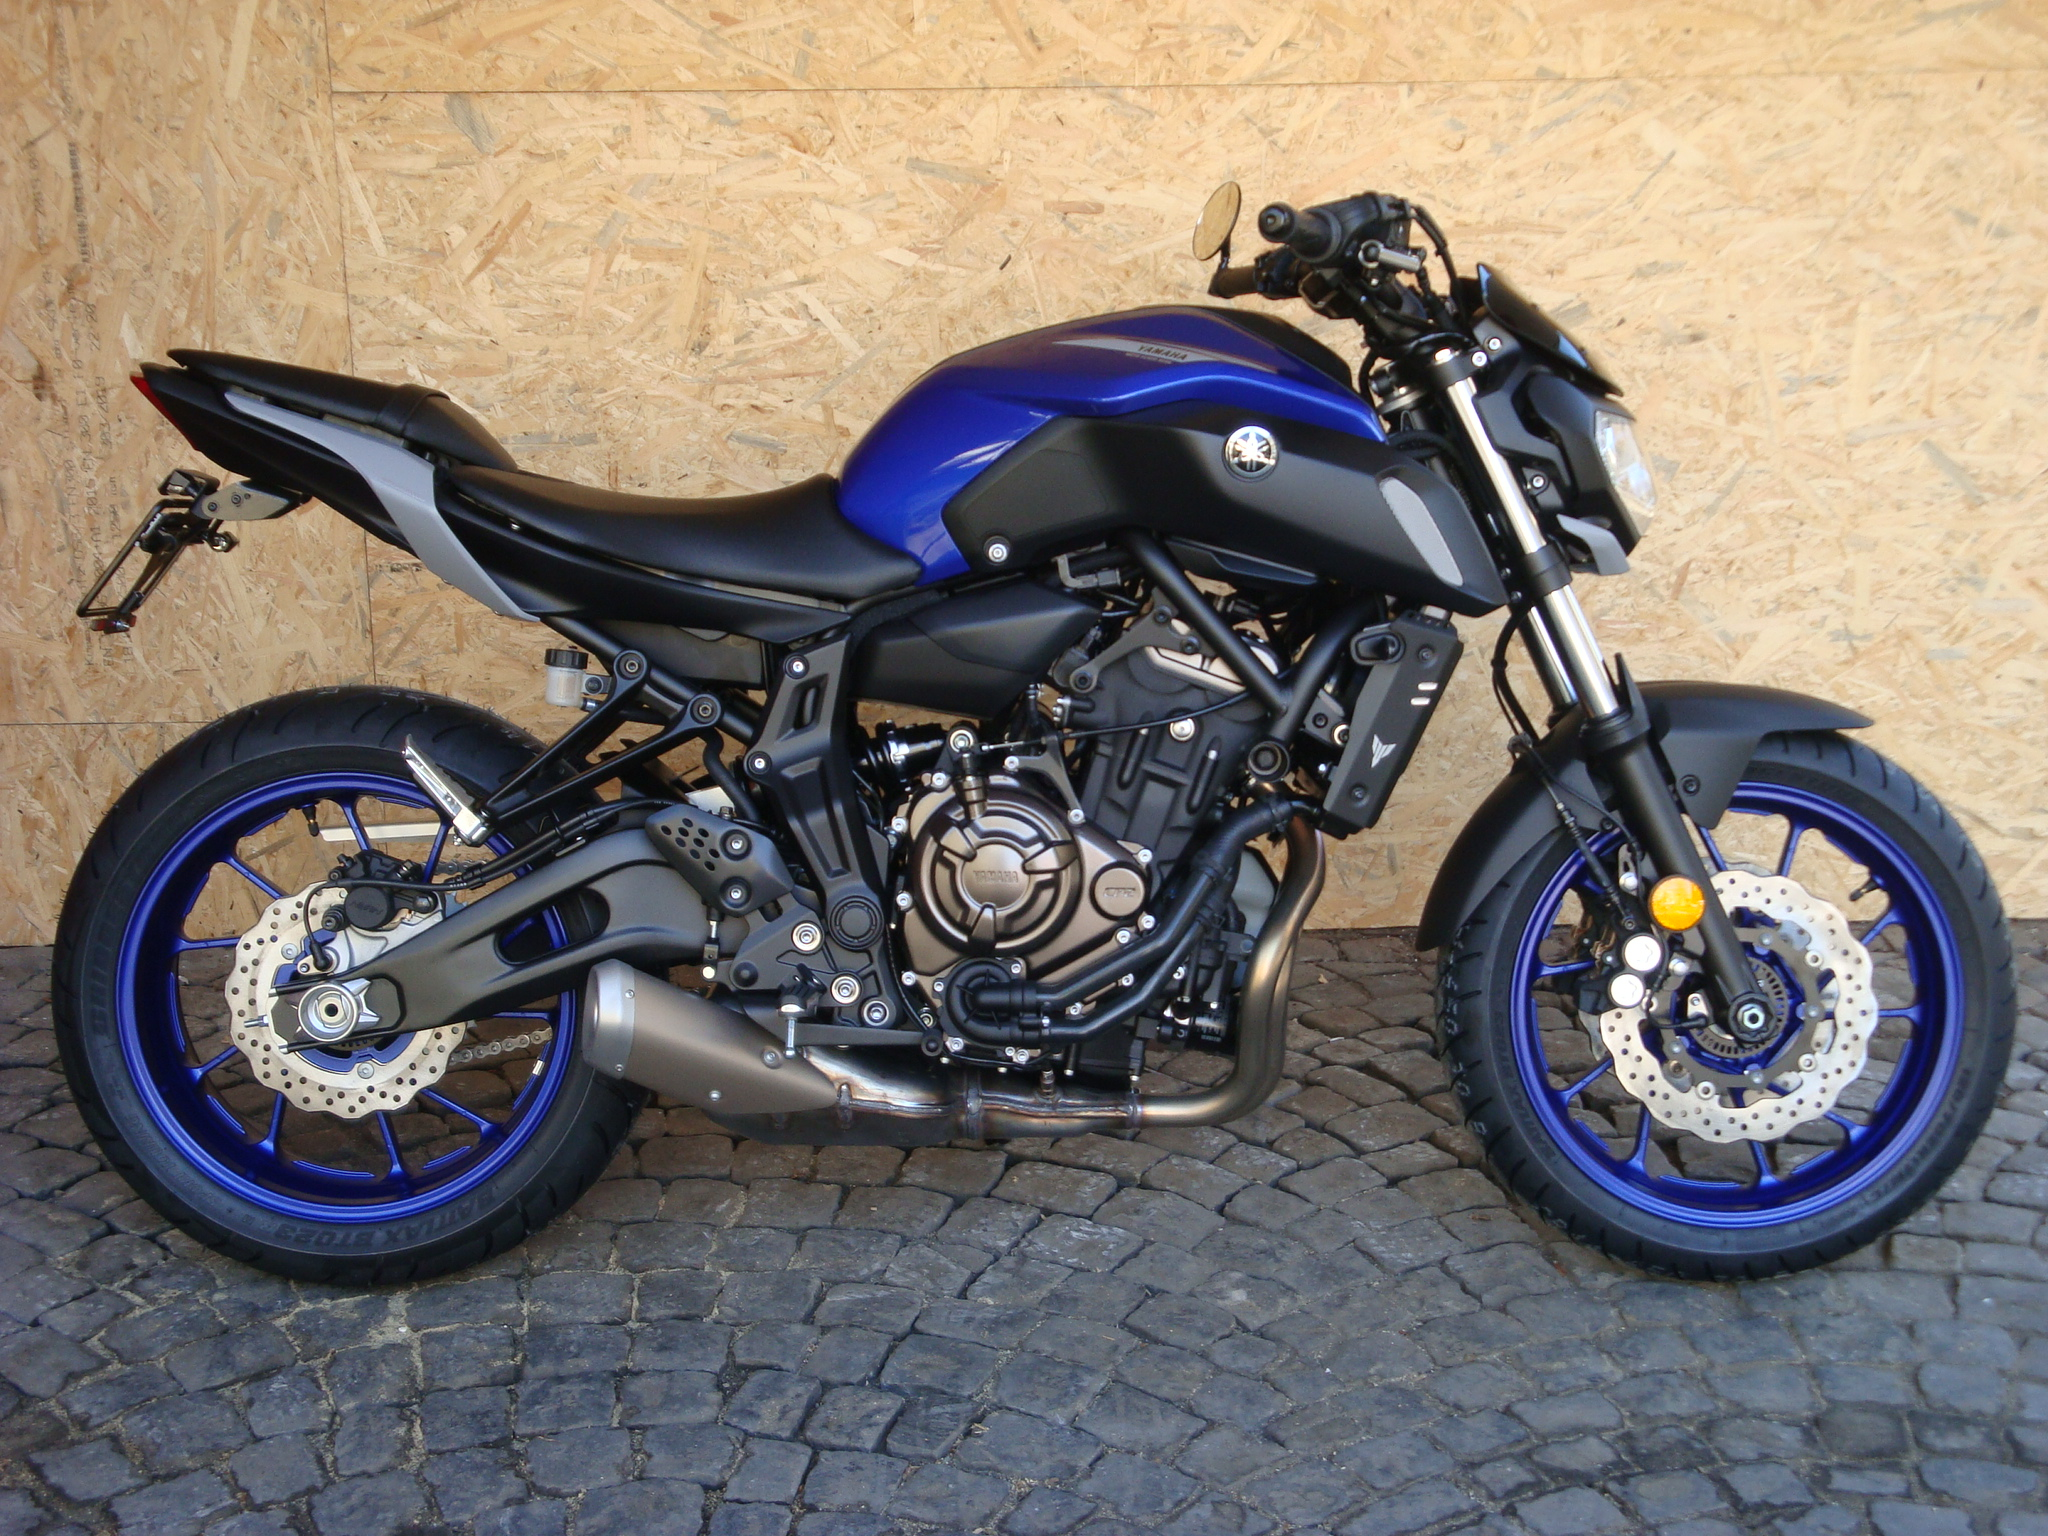 Yamaha MT 07 ABS spez. Edition